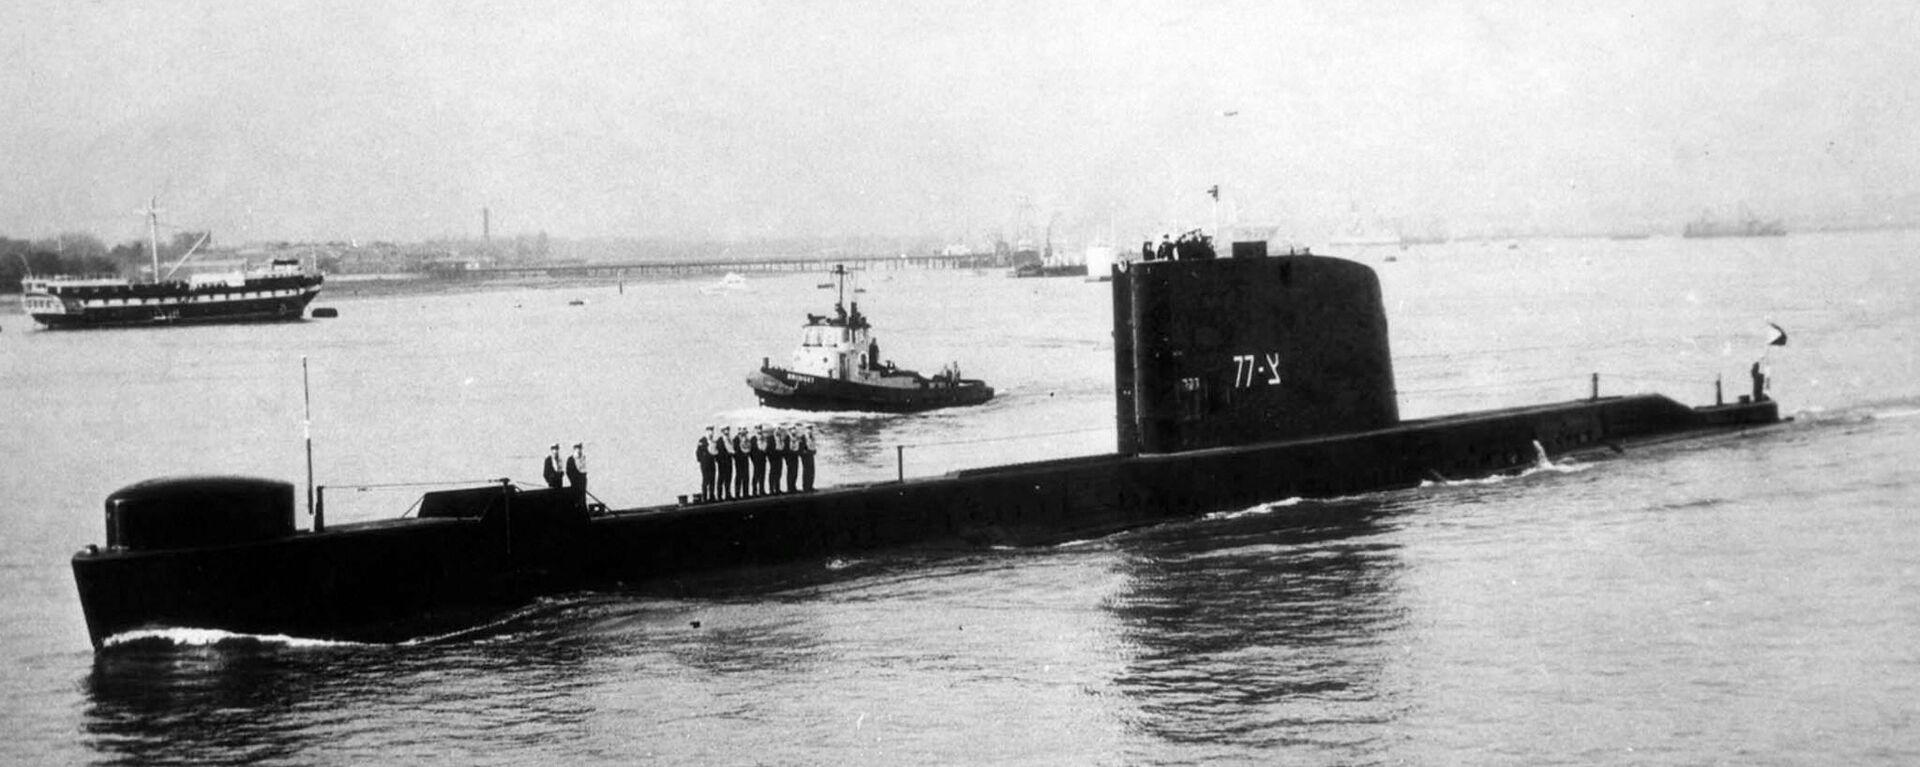 INS Dakar, submarino israelí - Sputnik Mundo, 1920, 26.01.2021